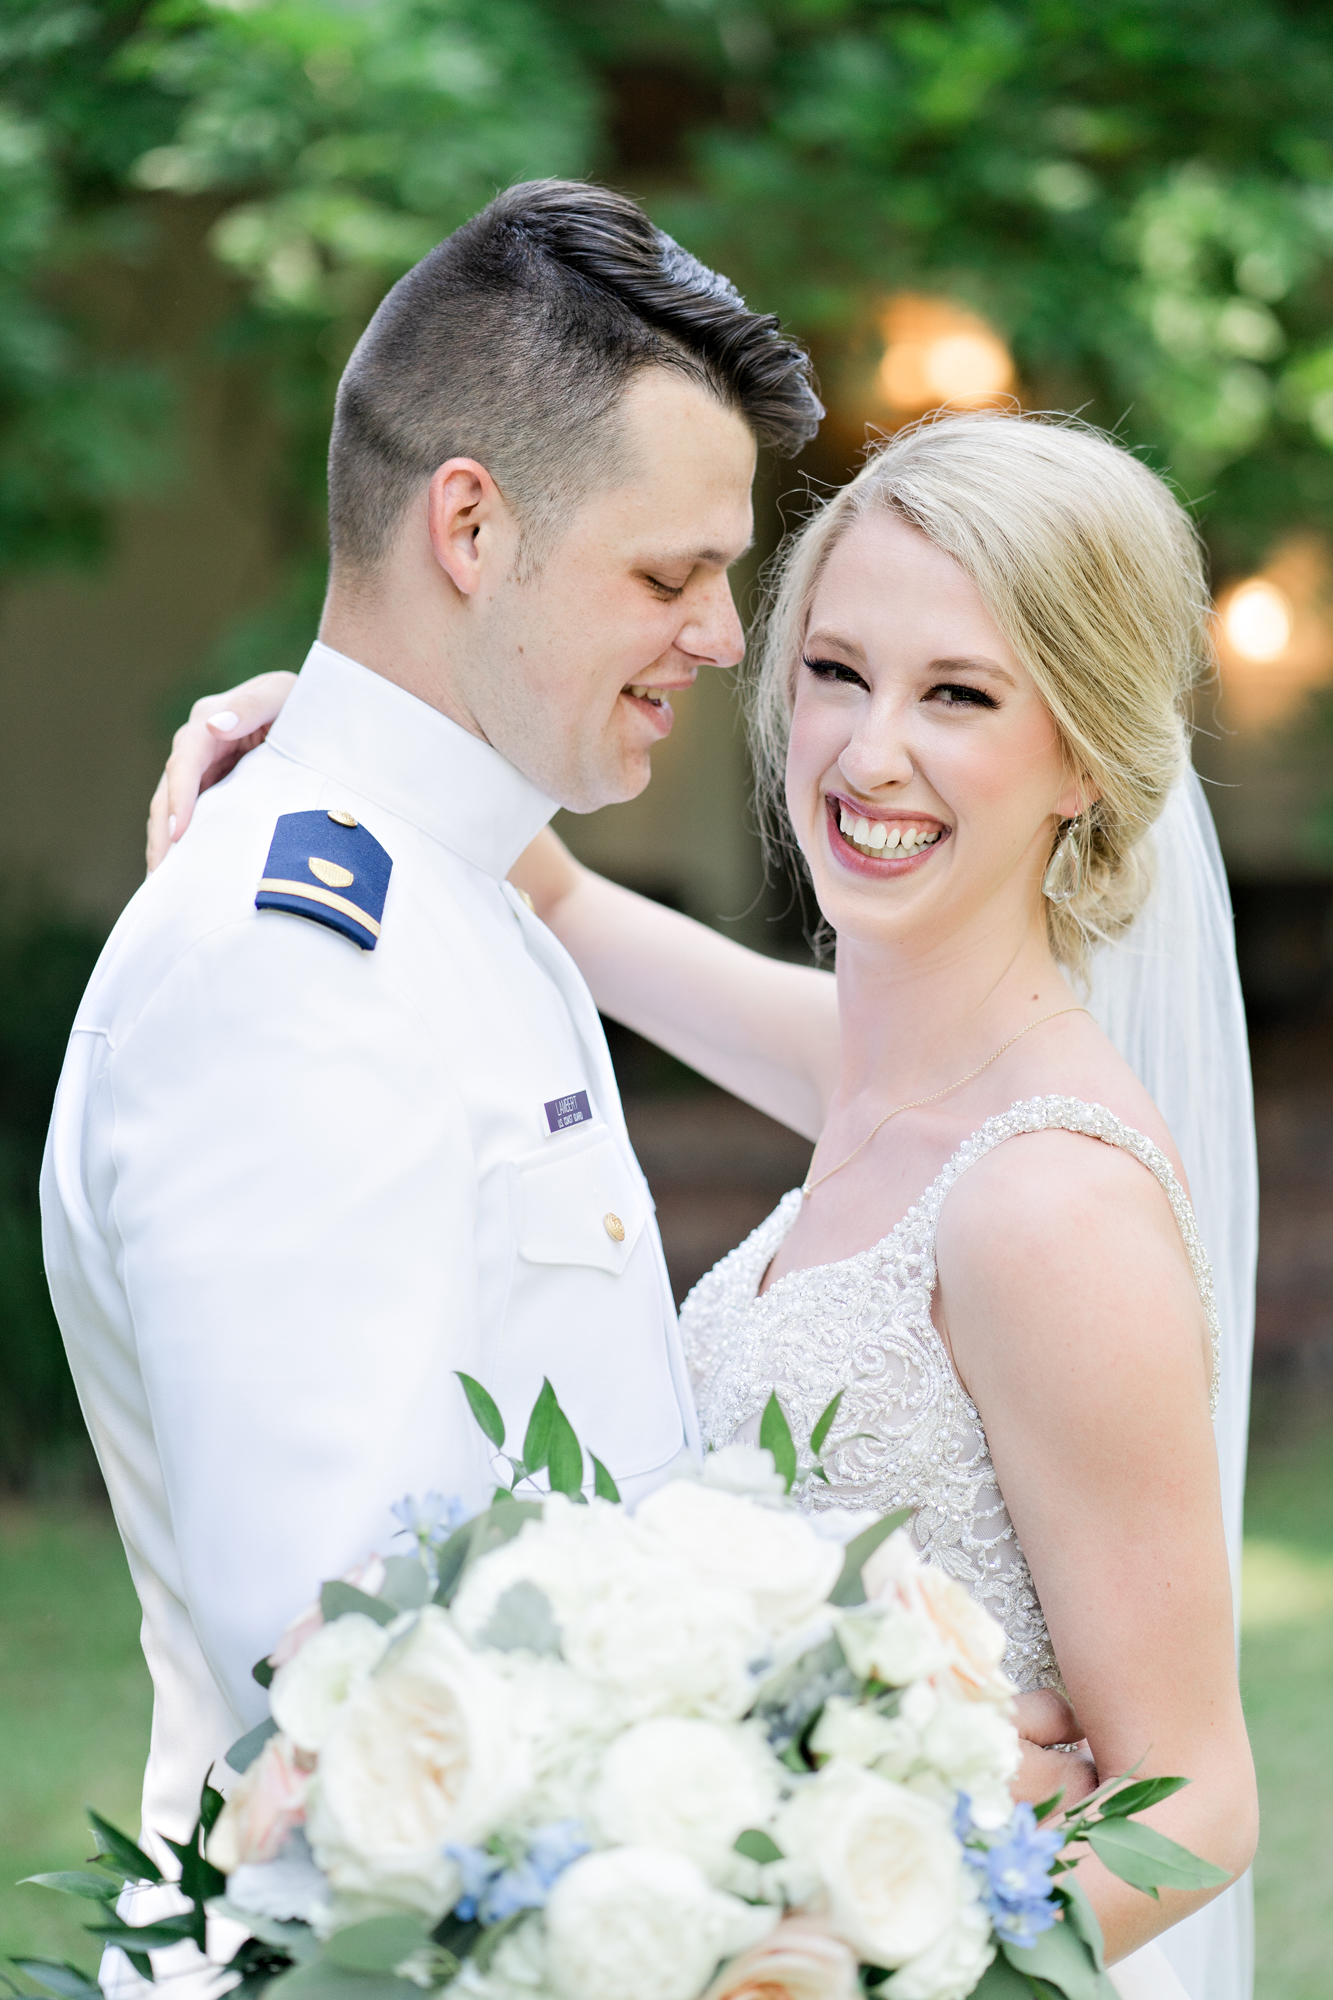 Alabama-Photographers-Nick-Drollette-Wedding-Photography-118.jpg